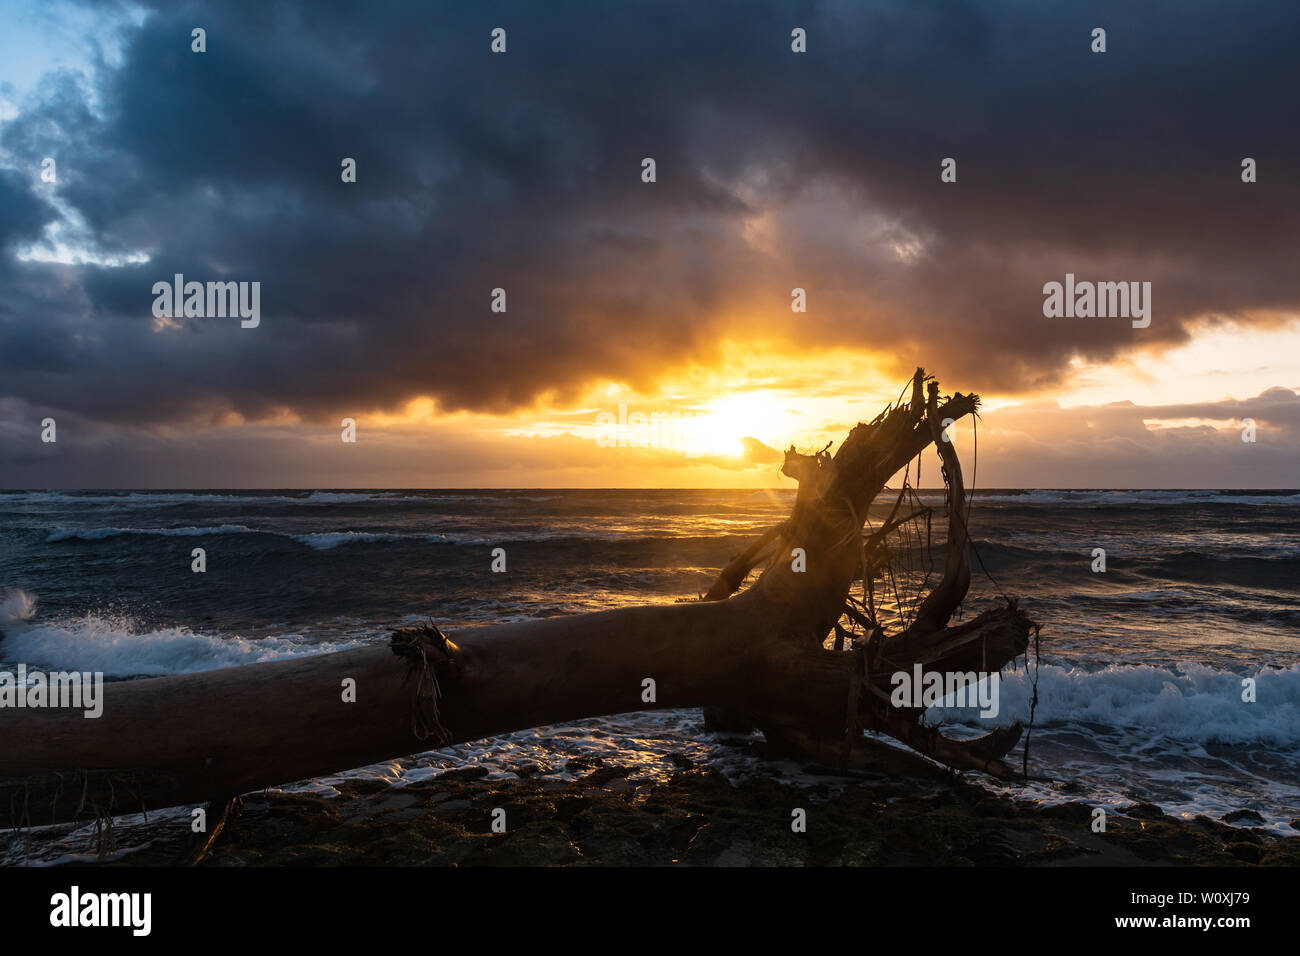 Árbol muerto en la playa de sunrise, Kauaii, Hawai Foto de stock